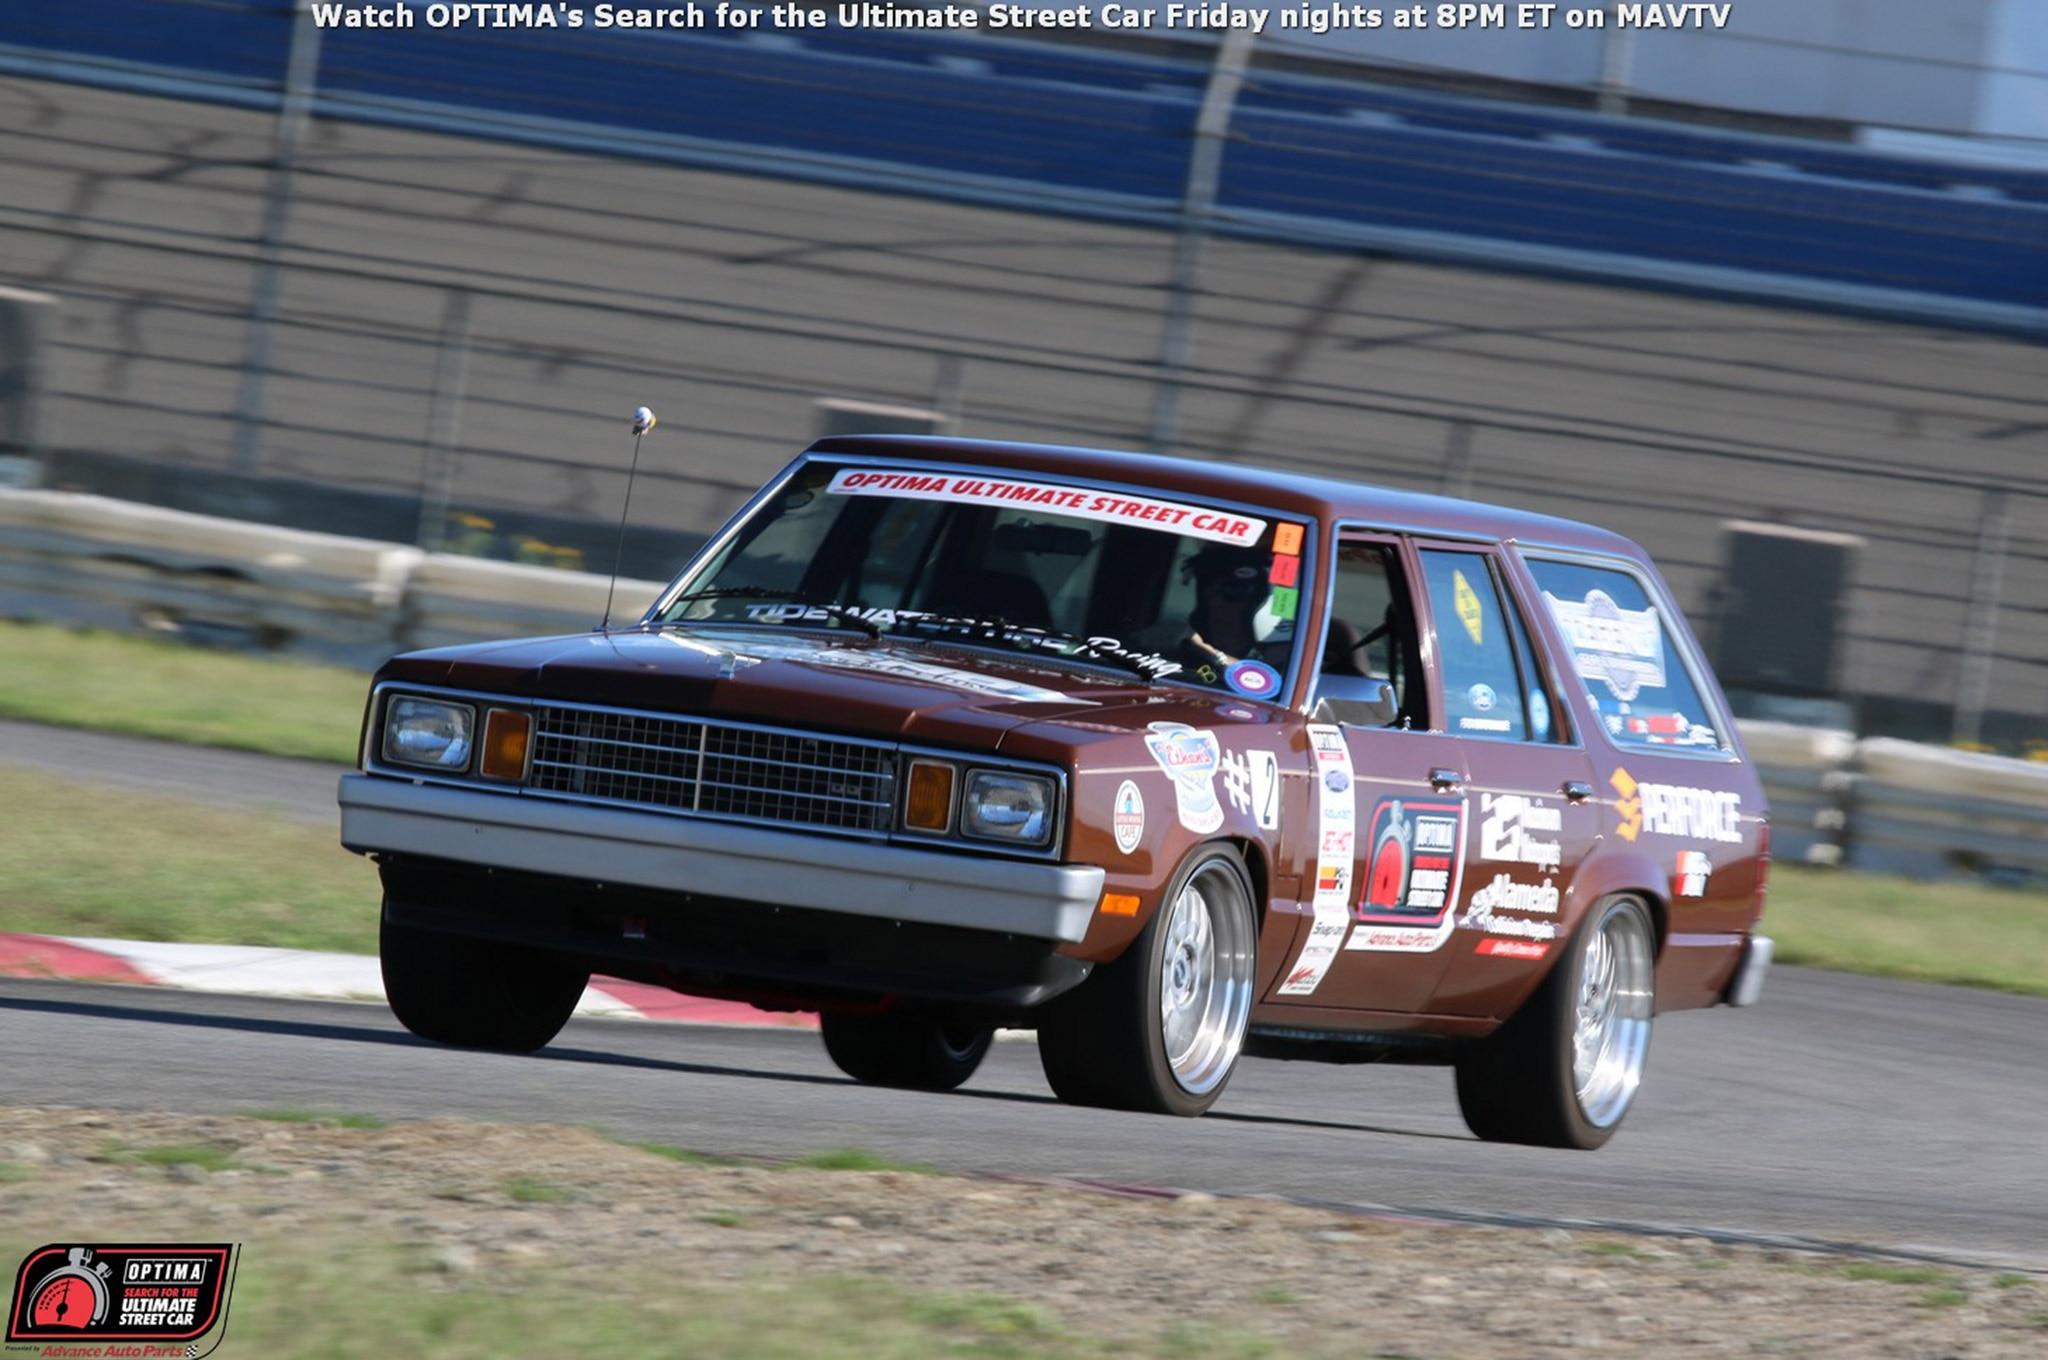 Martin Pond 1980 Mercury Zephyr Drive OPTIMA Fontana 2015 60